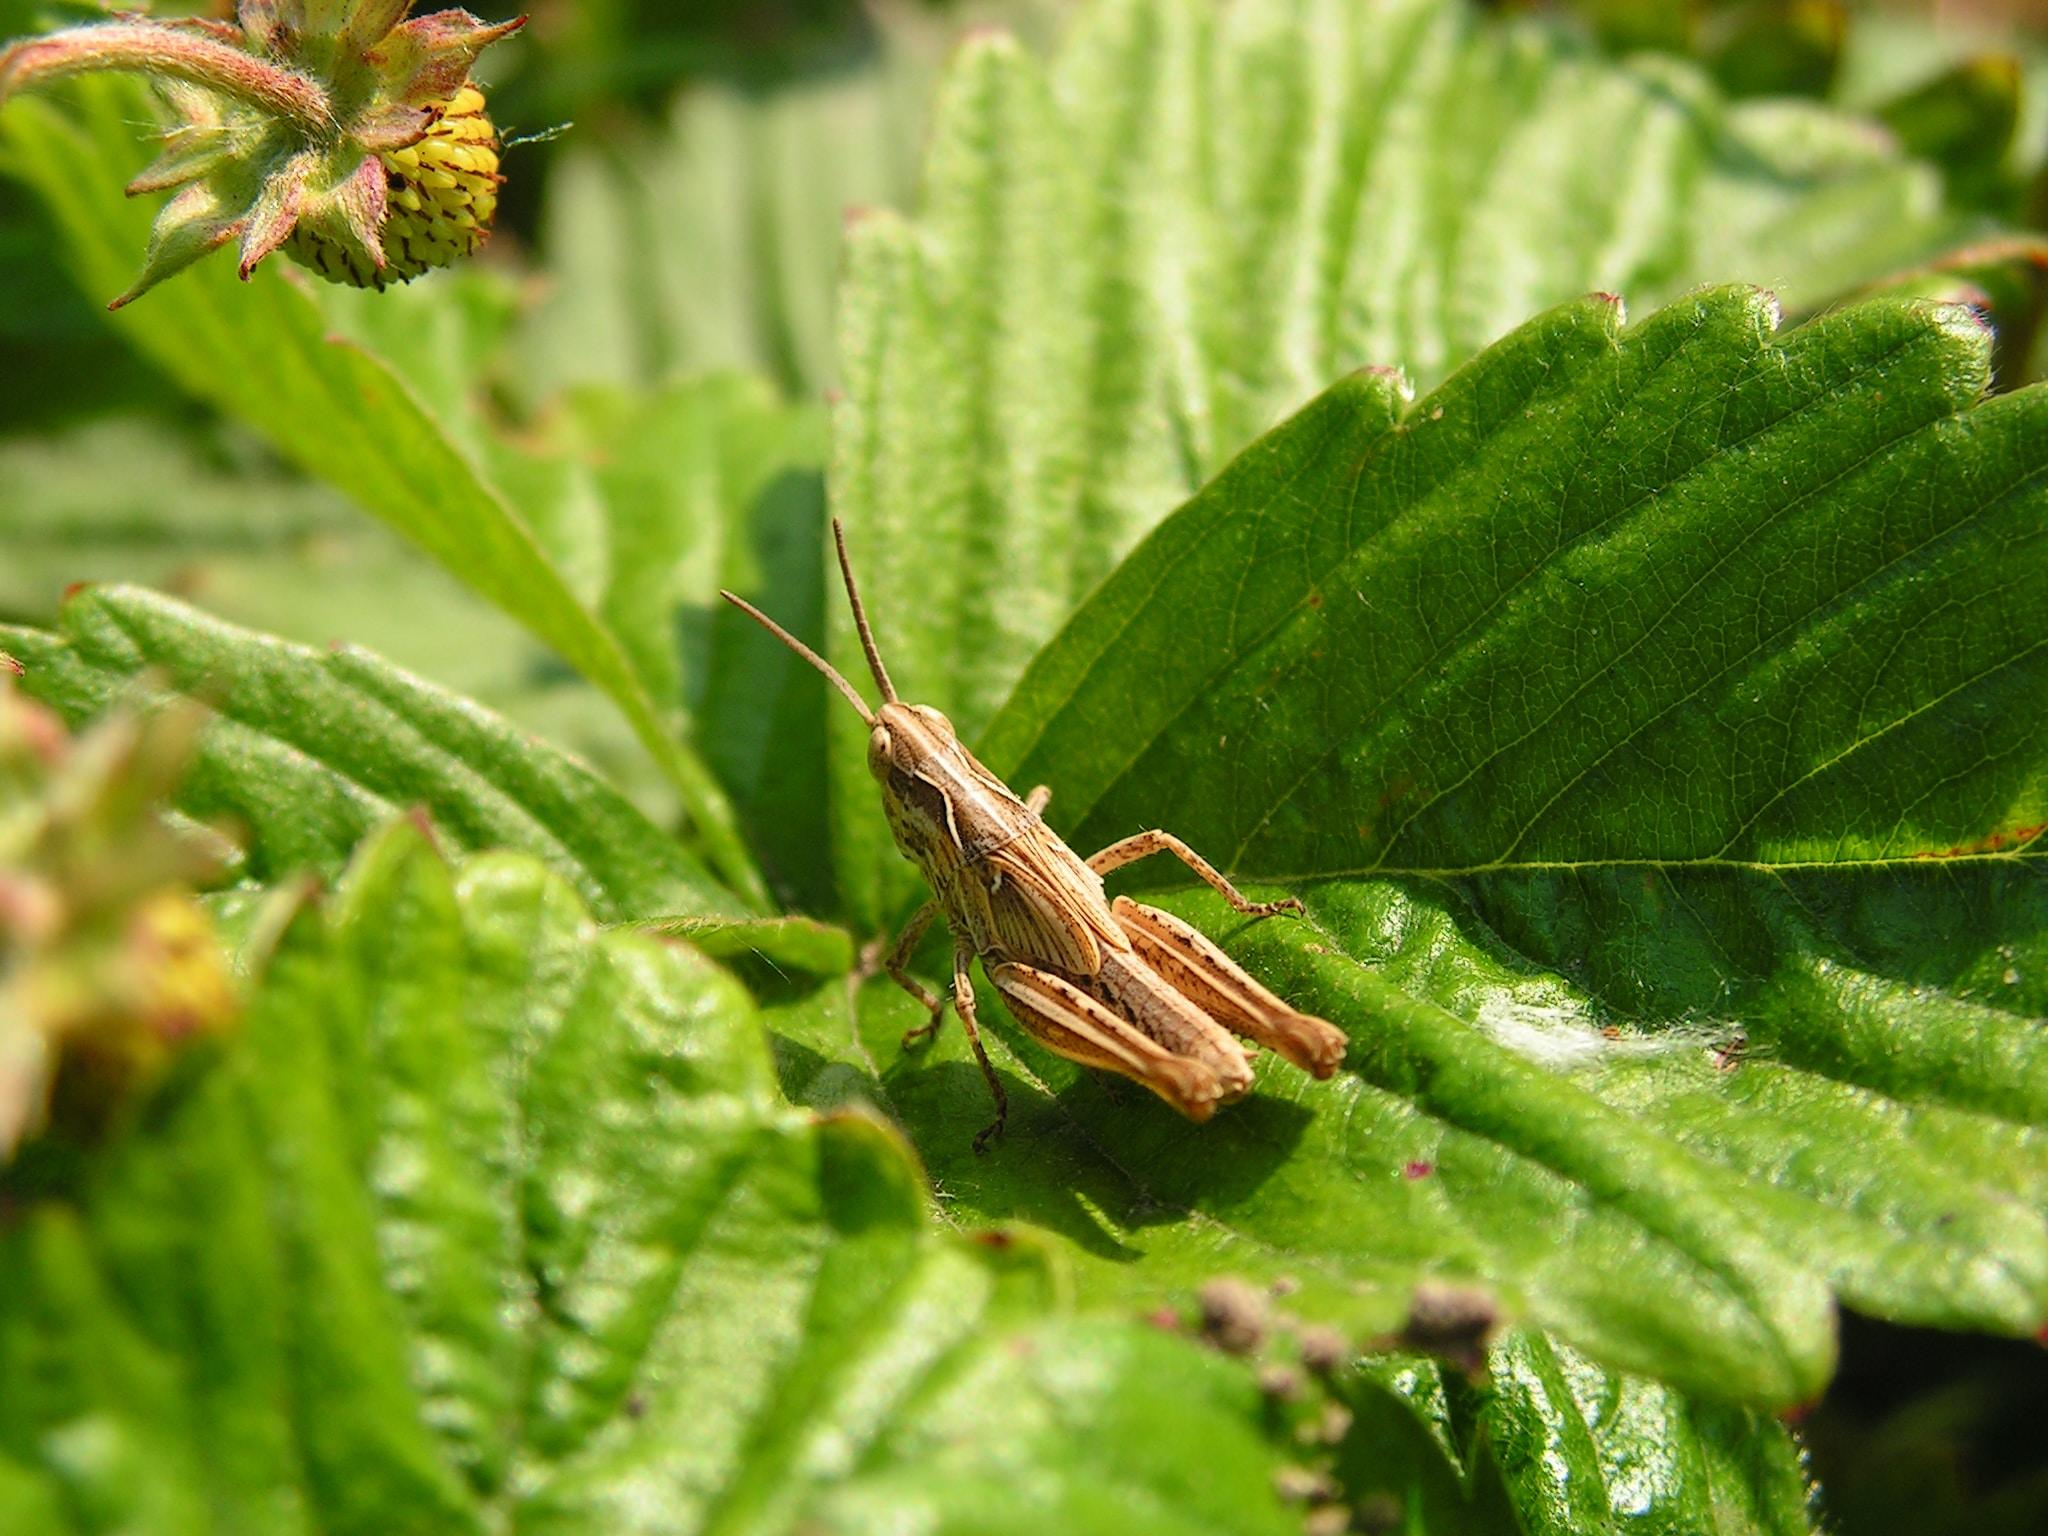 Q Steer Grasshopper Grasshopper Pictures |...